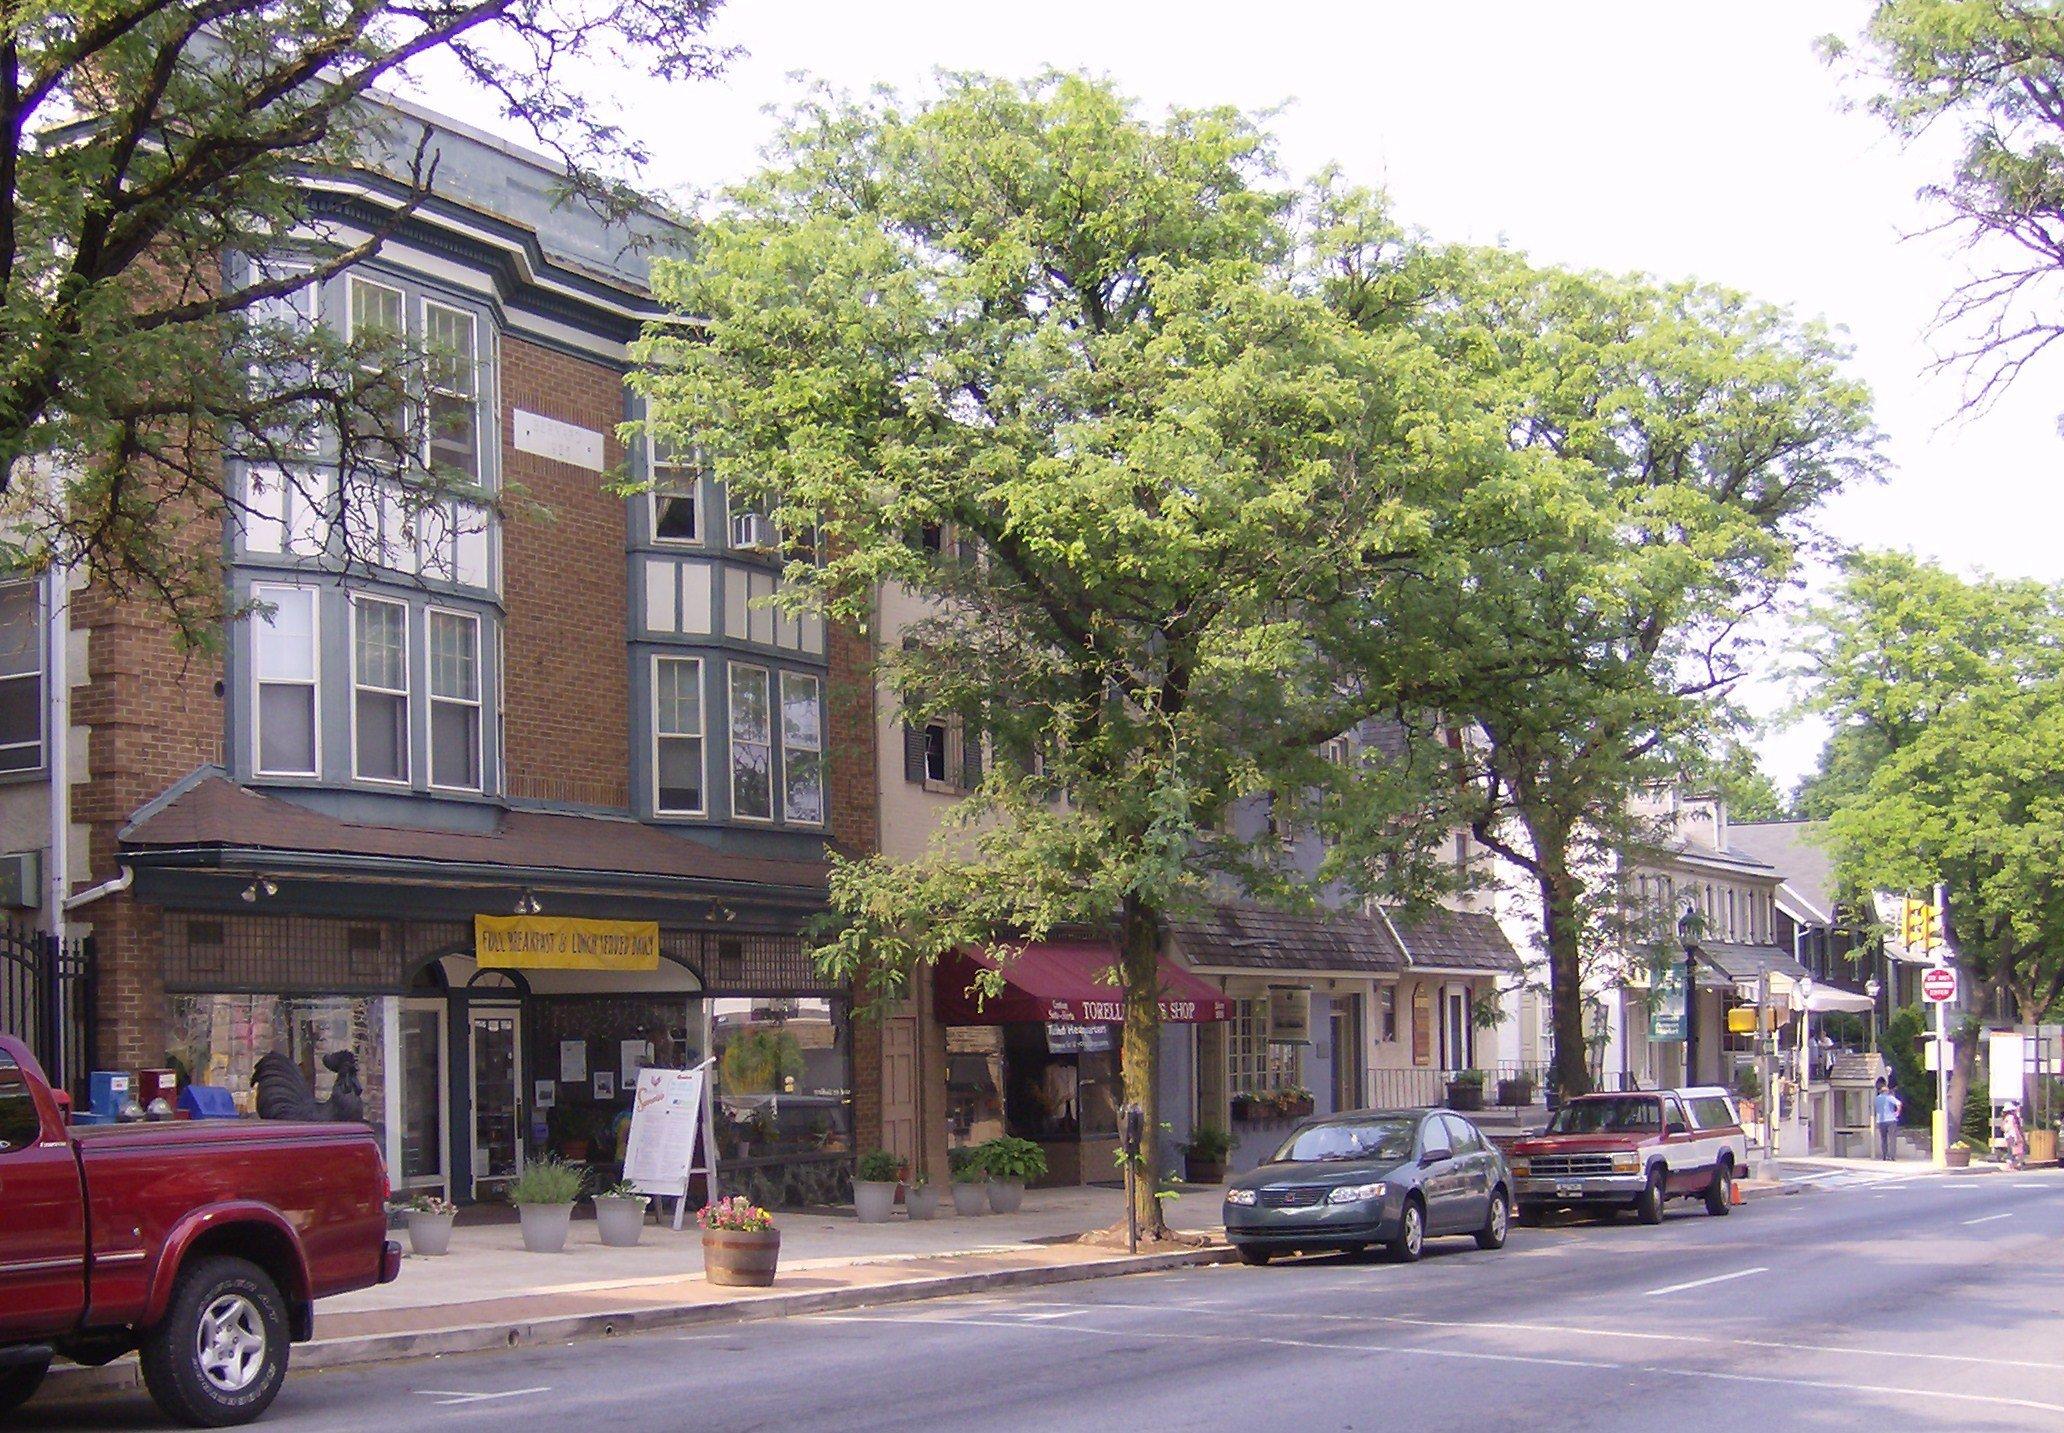 Radon Testing and Radon Mitigation IN KENNETT SQUARE, PA